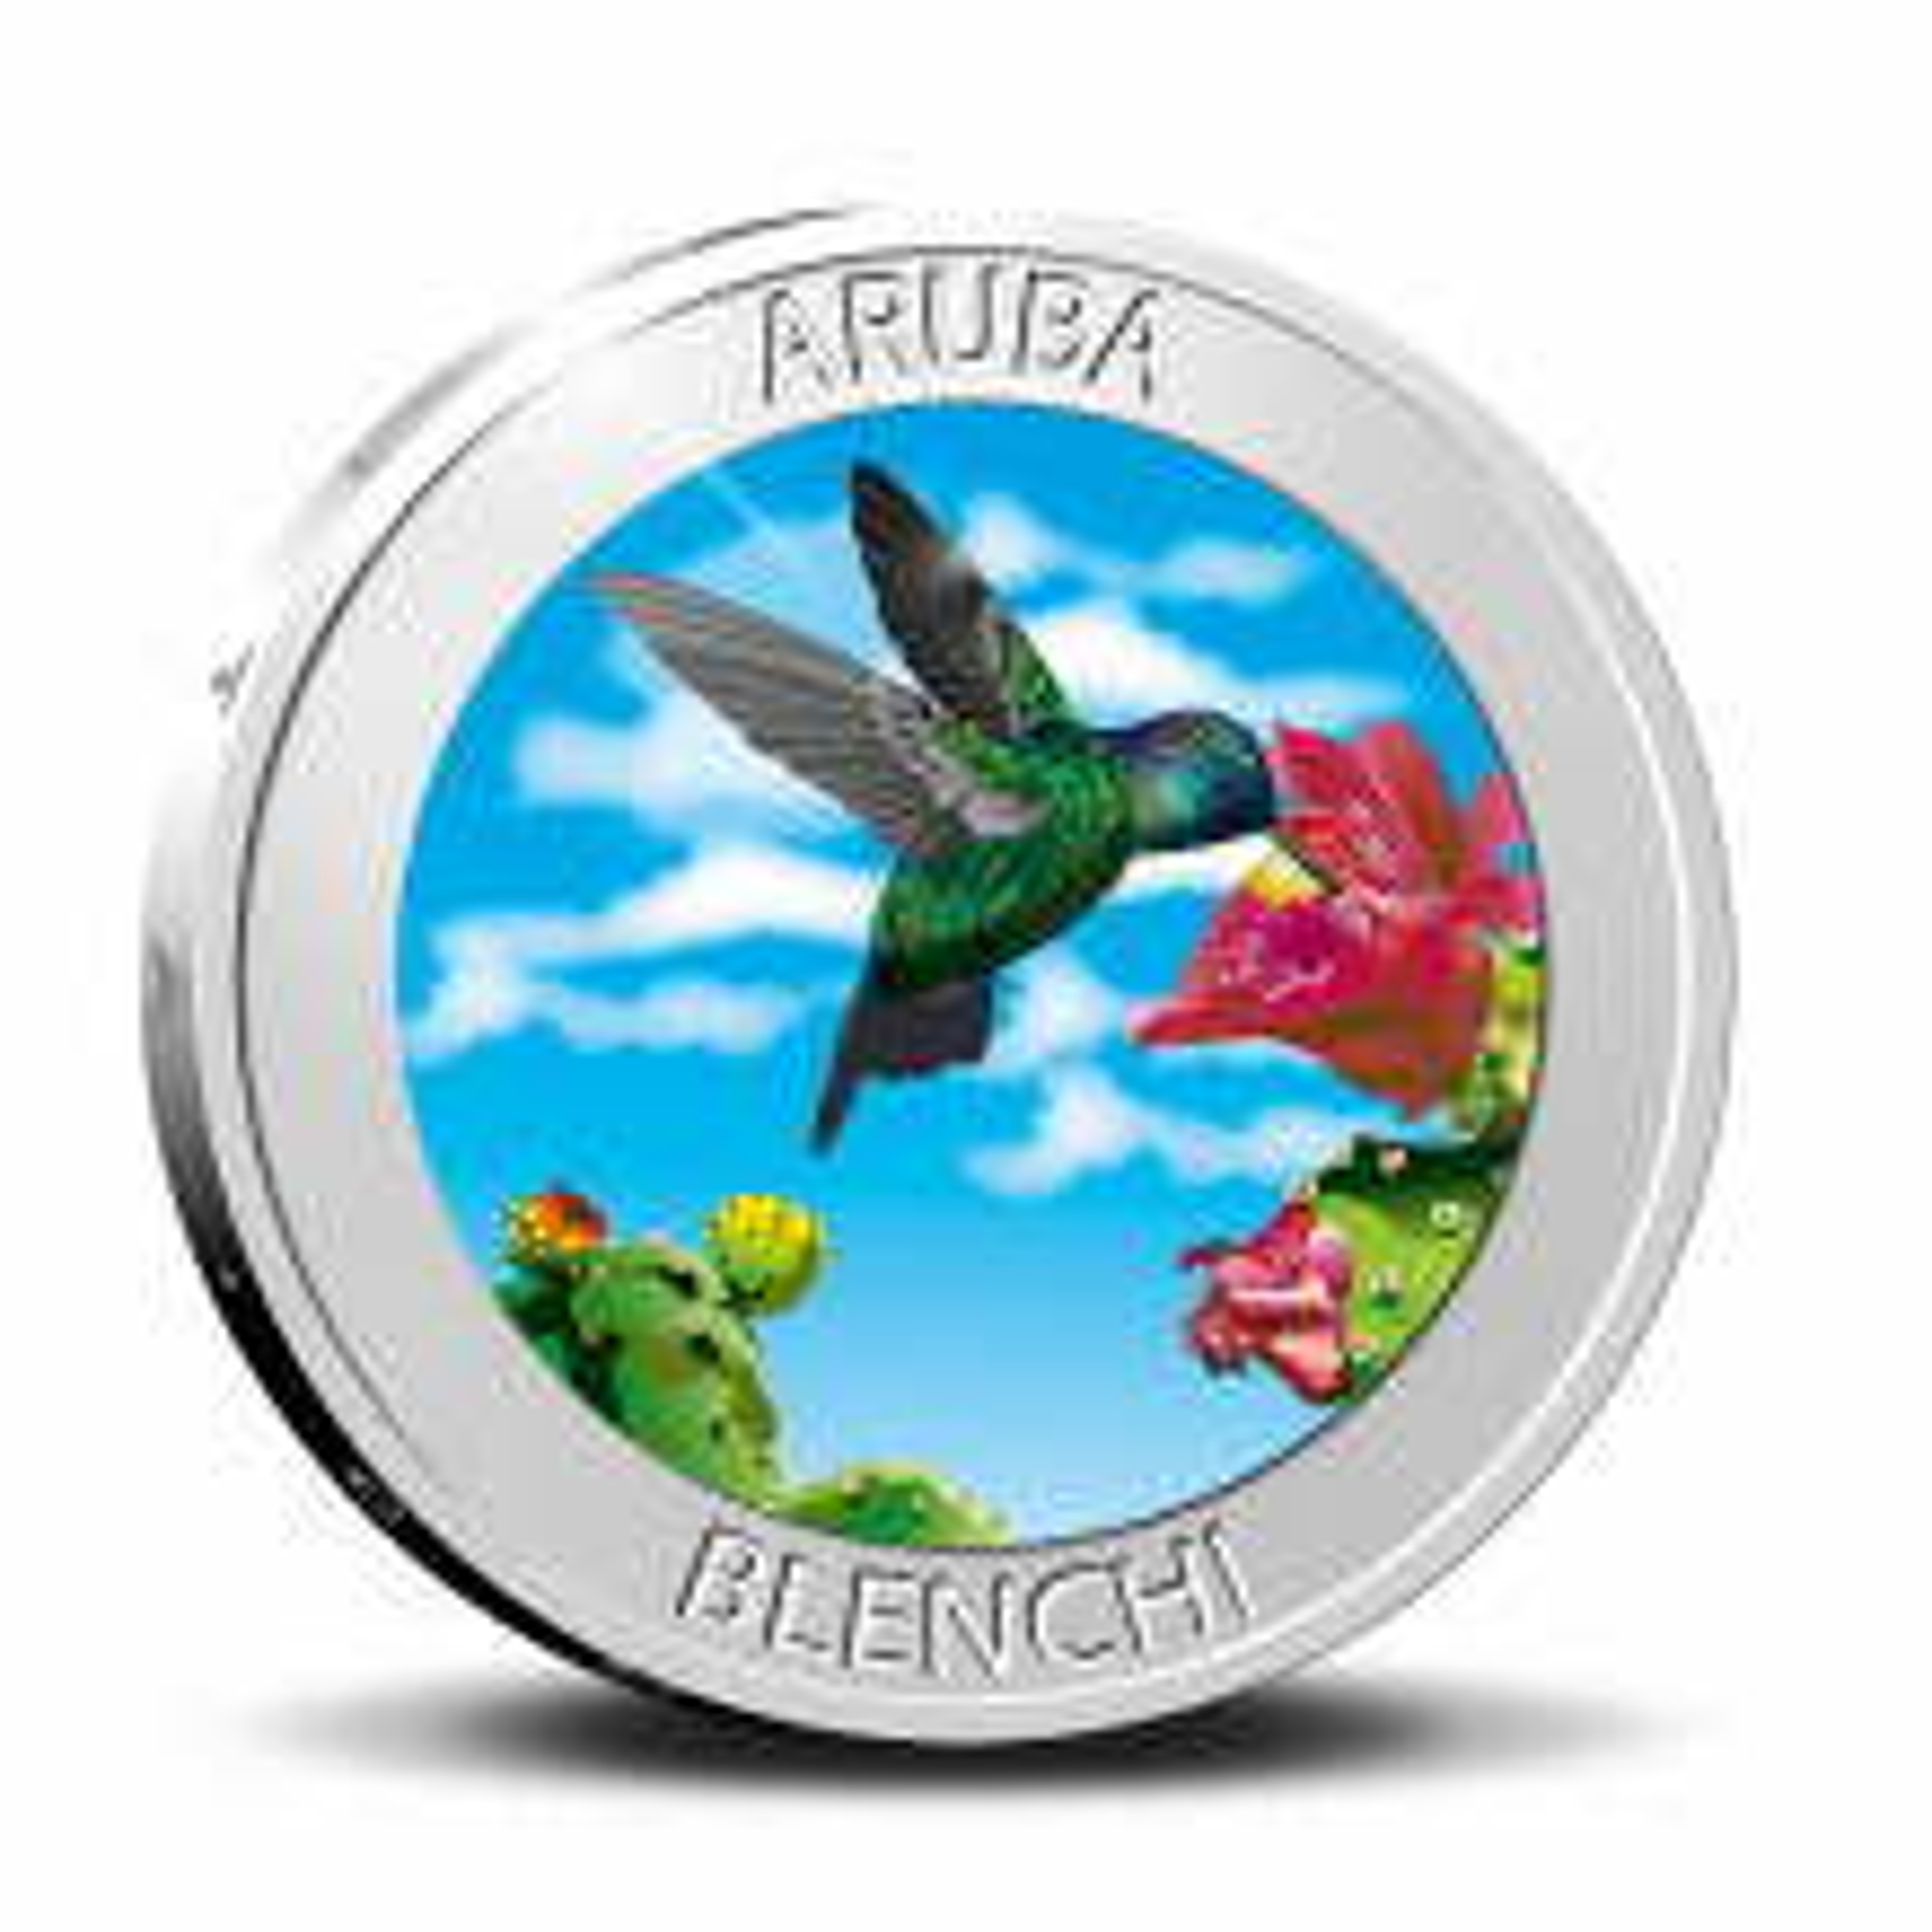 Zilveren munt 5 Florin Blenchi 2020 Proof